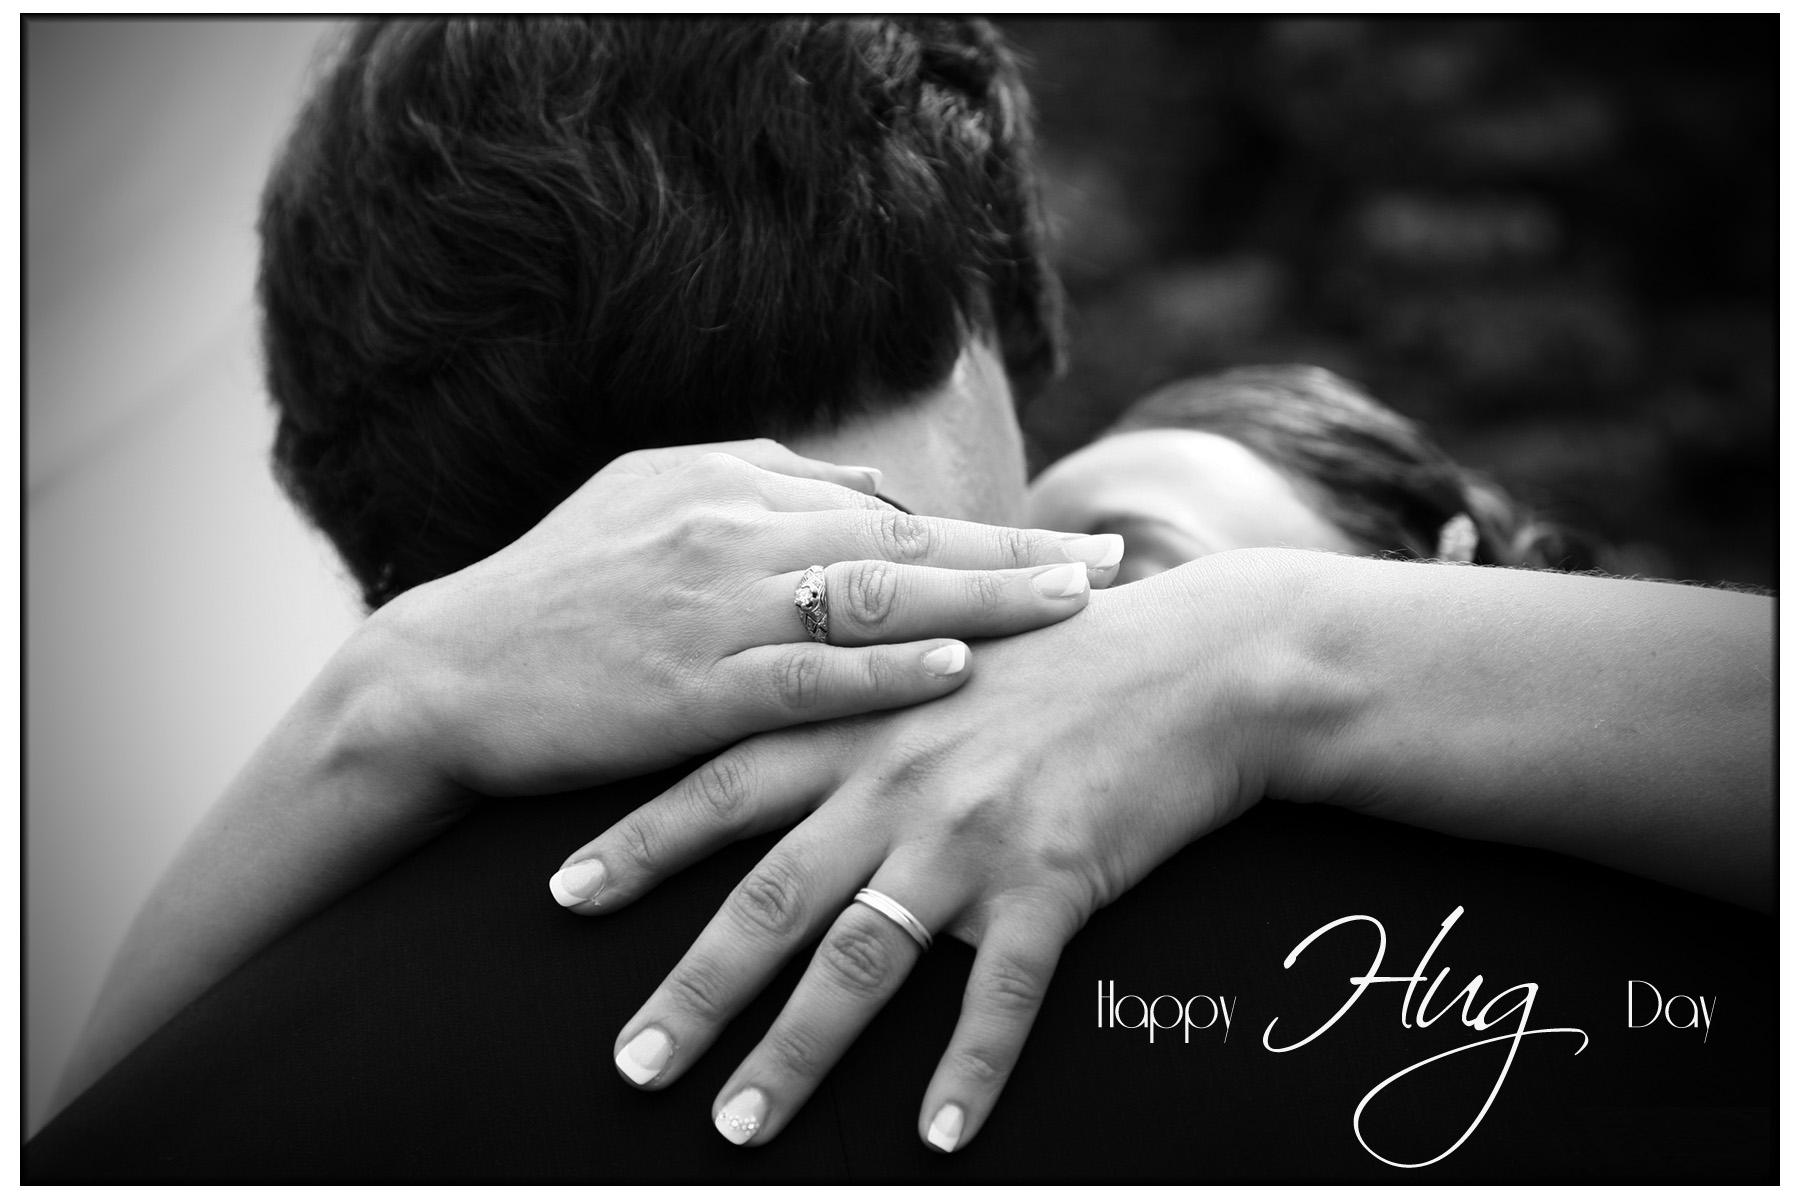 Hug Day Image for Girlfriend & Boyfriend